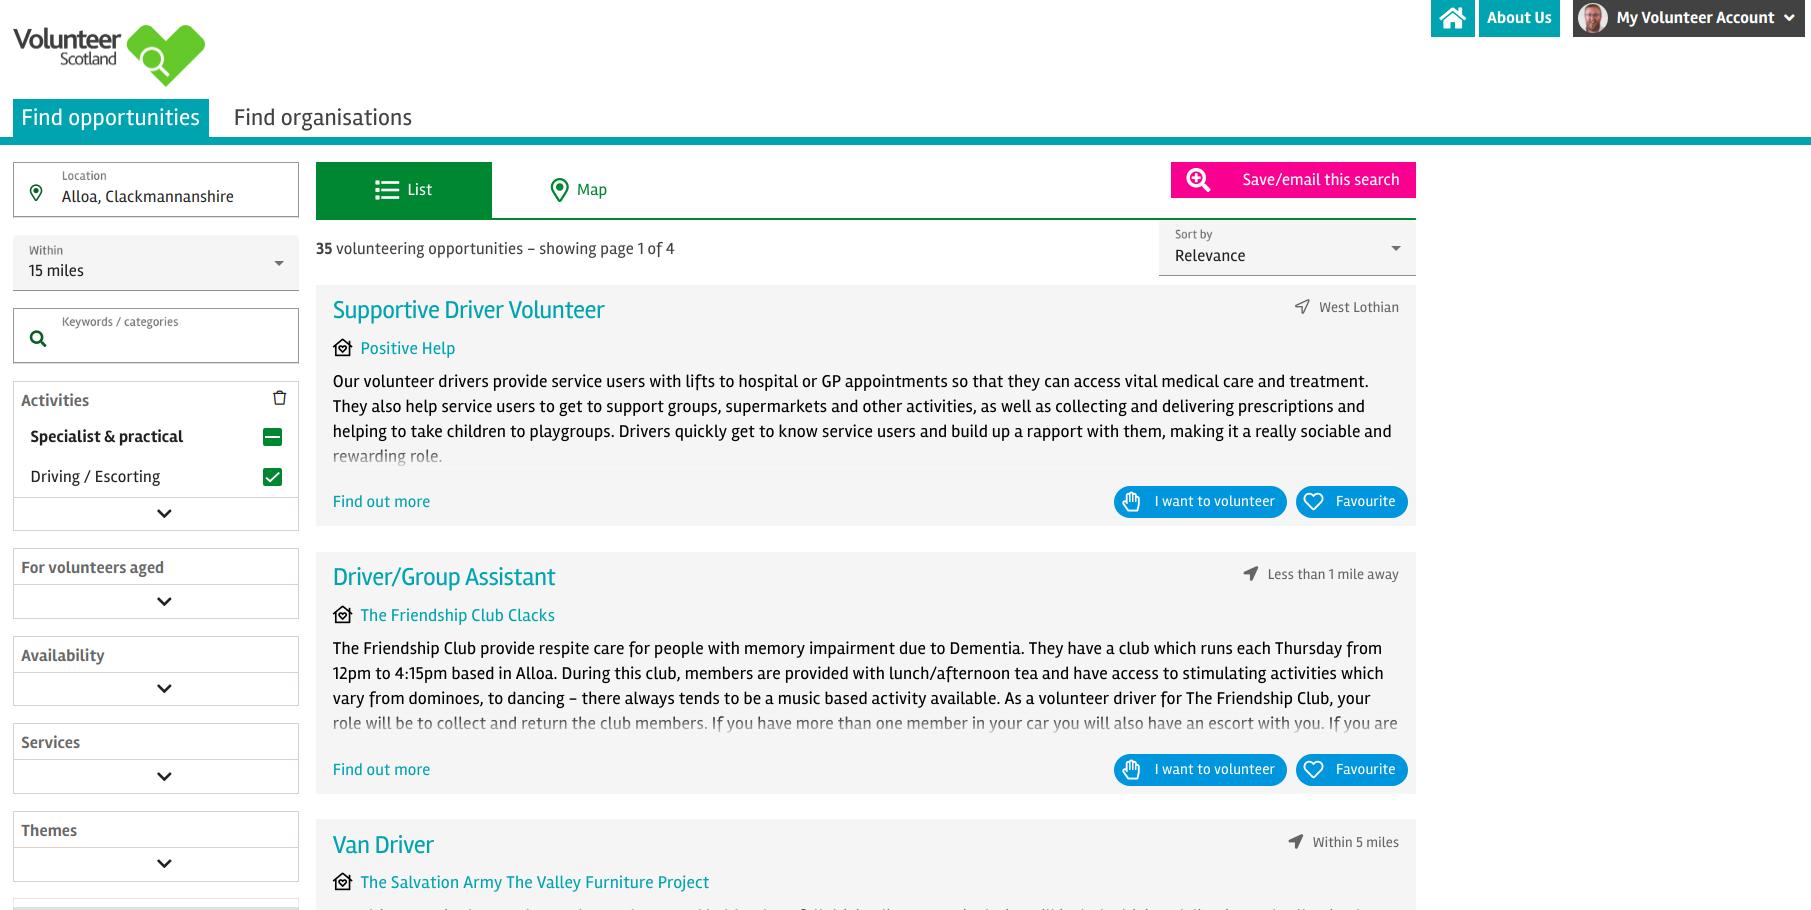 Screenshot of the Volunteer Scotland Search website